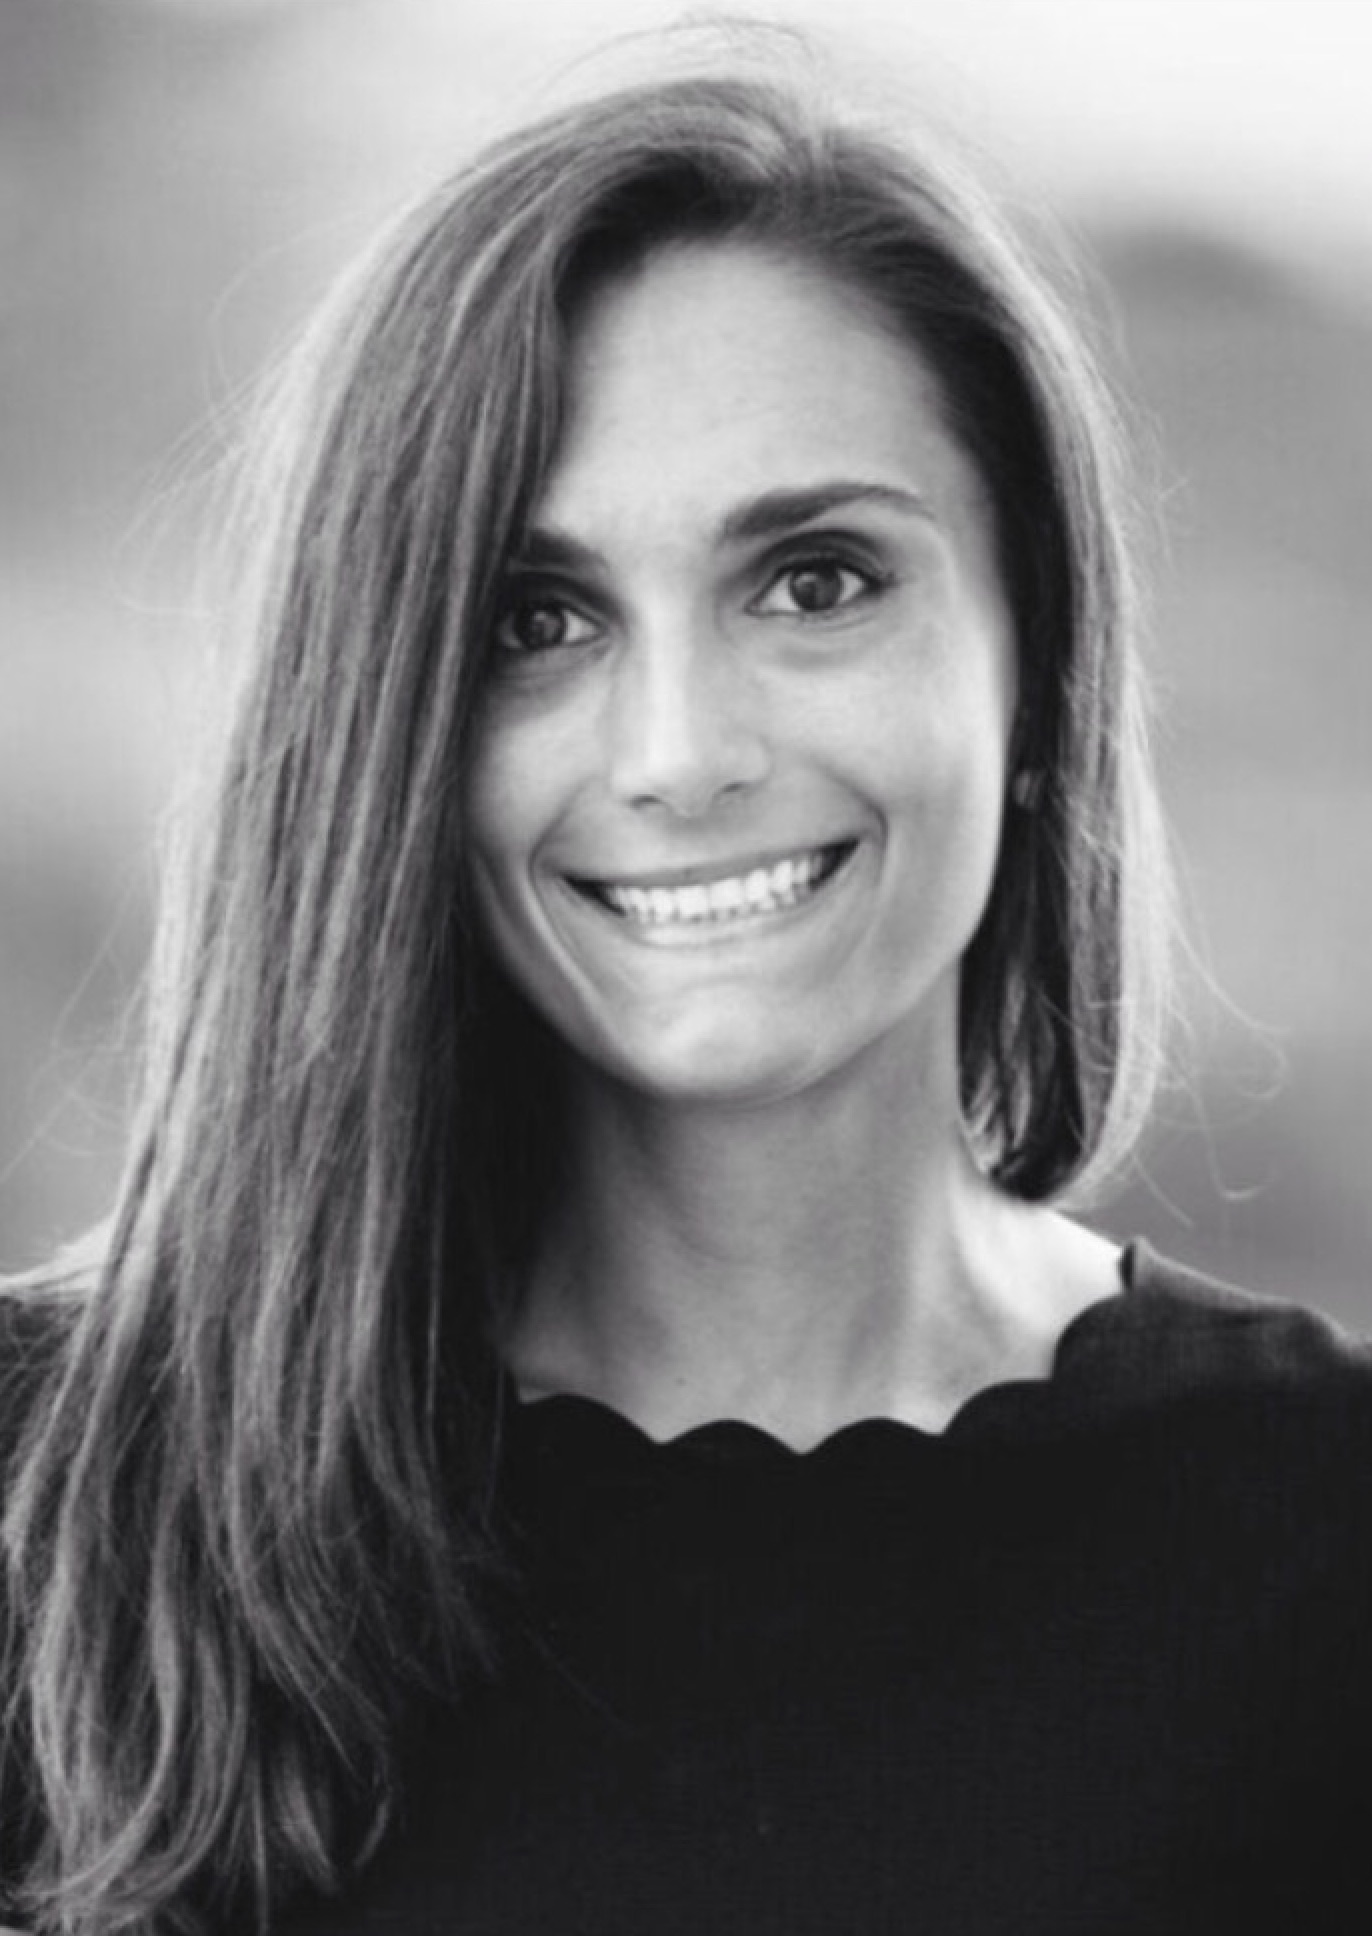 Stephanie Tedeschi